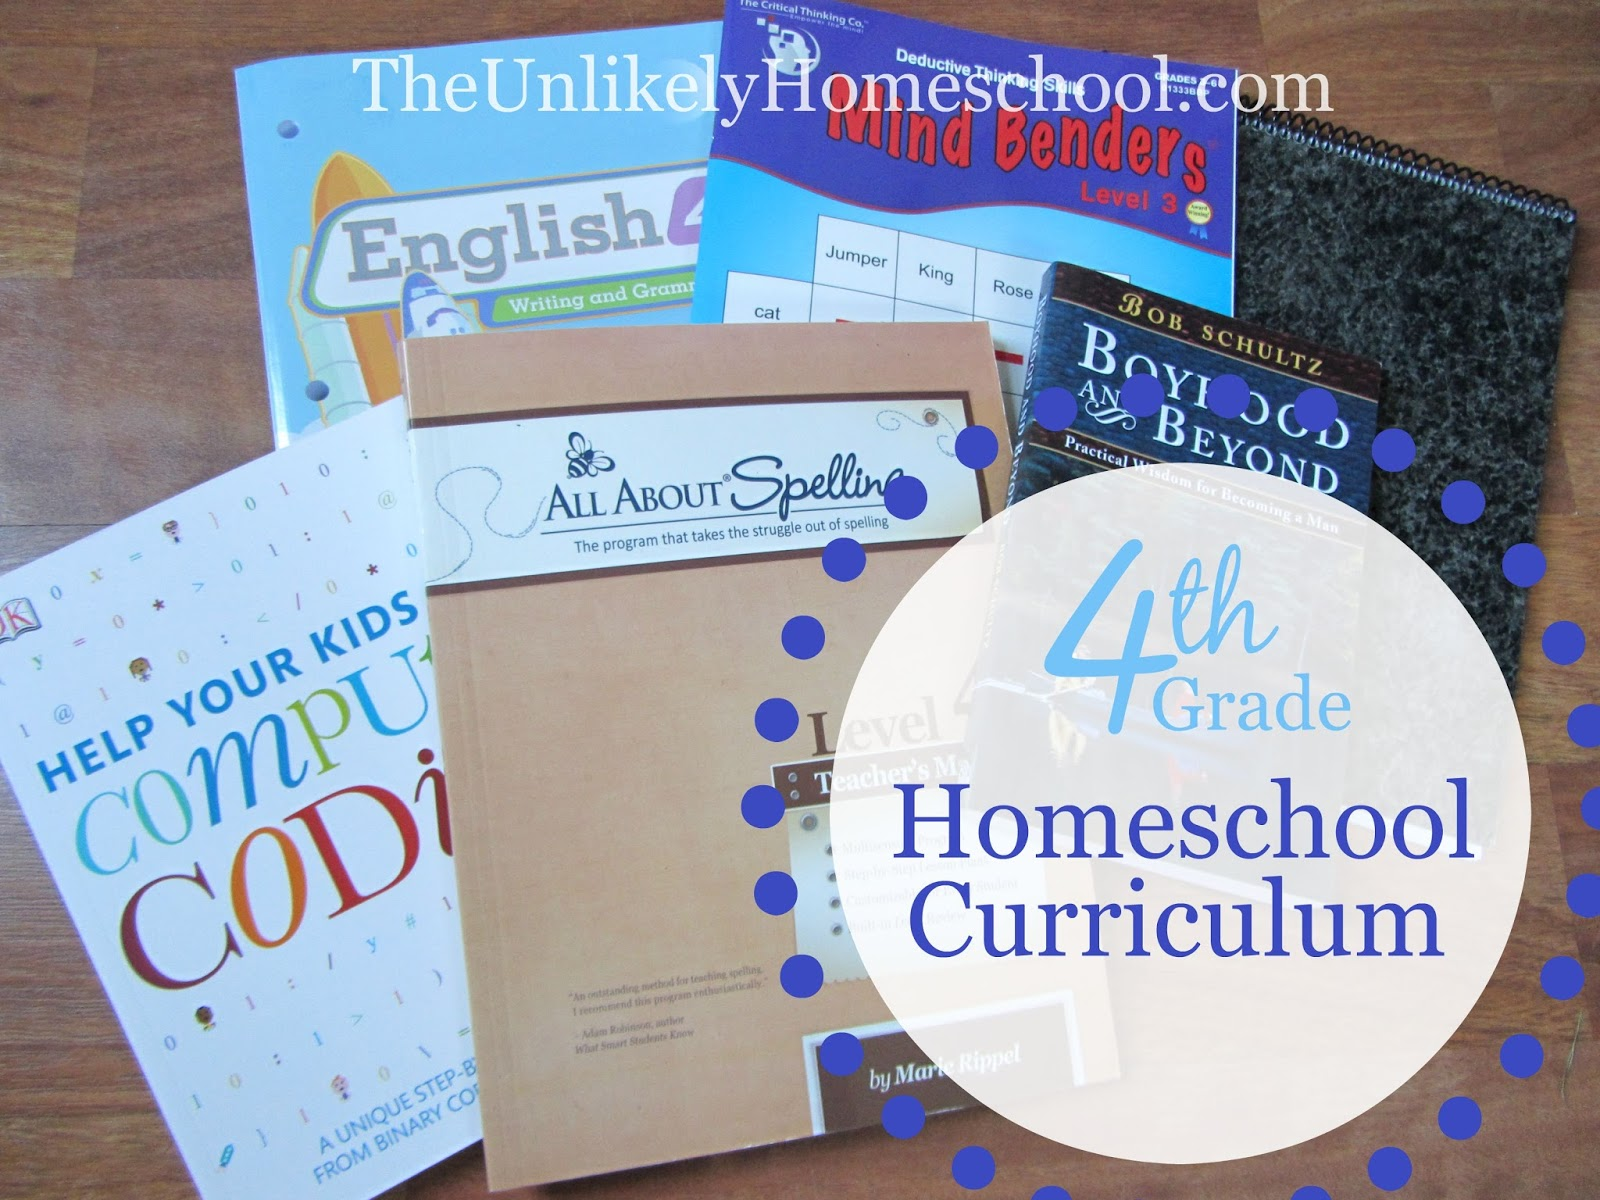 The Unlikely Homeschool 4th Grade Homeschool Curriculum